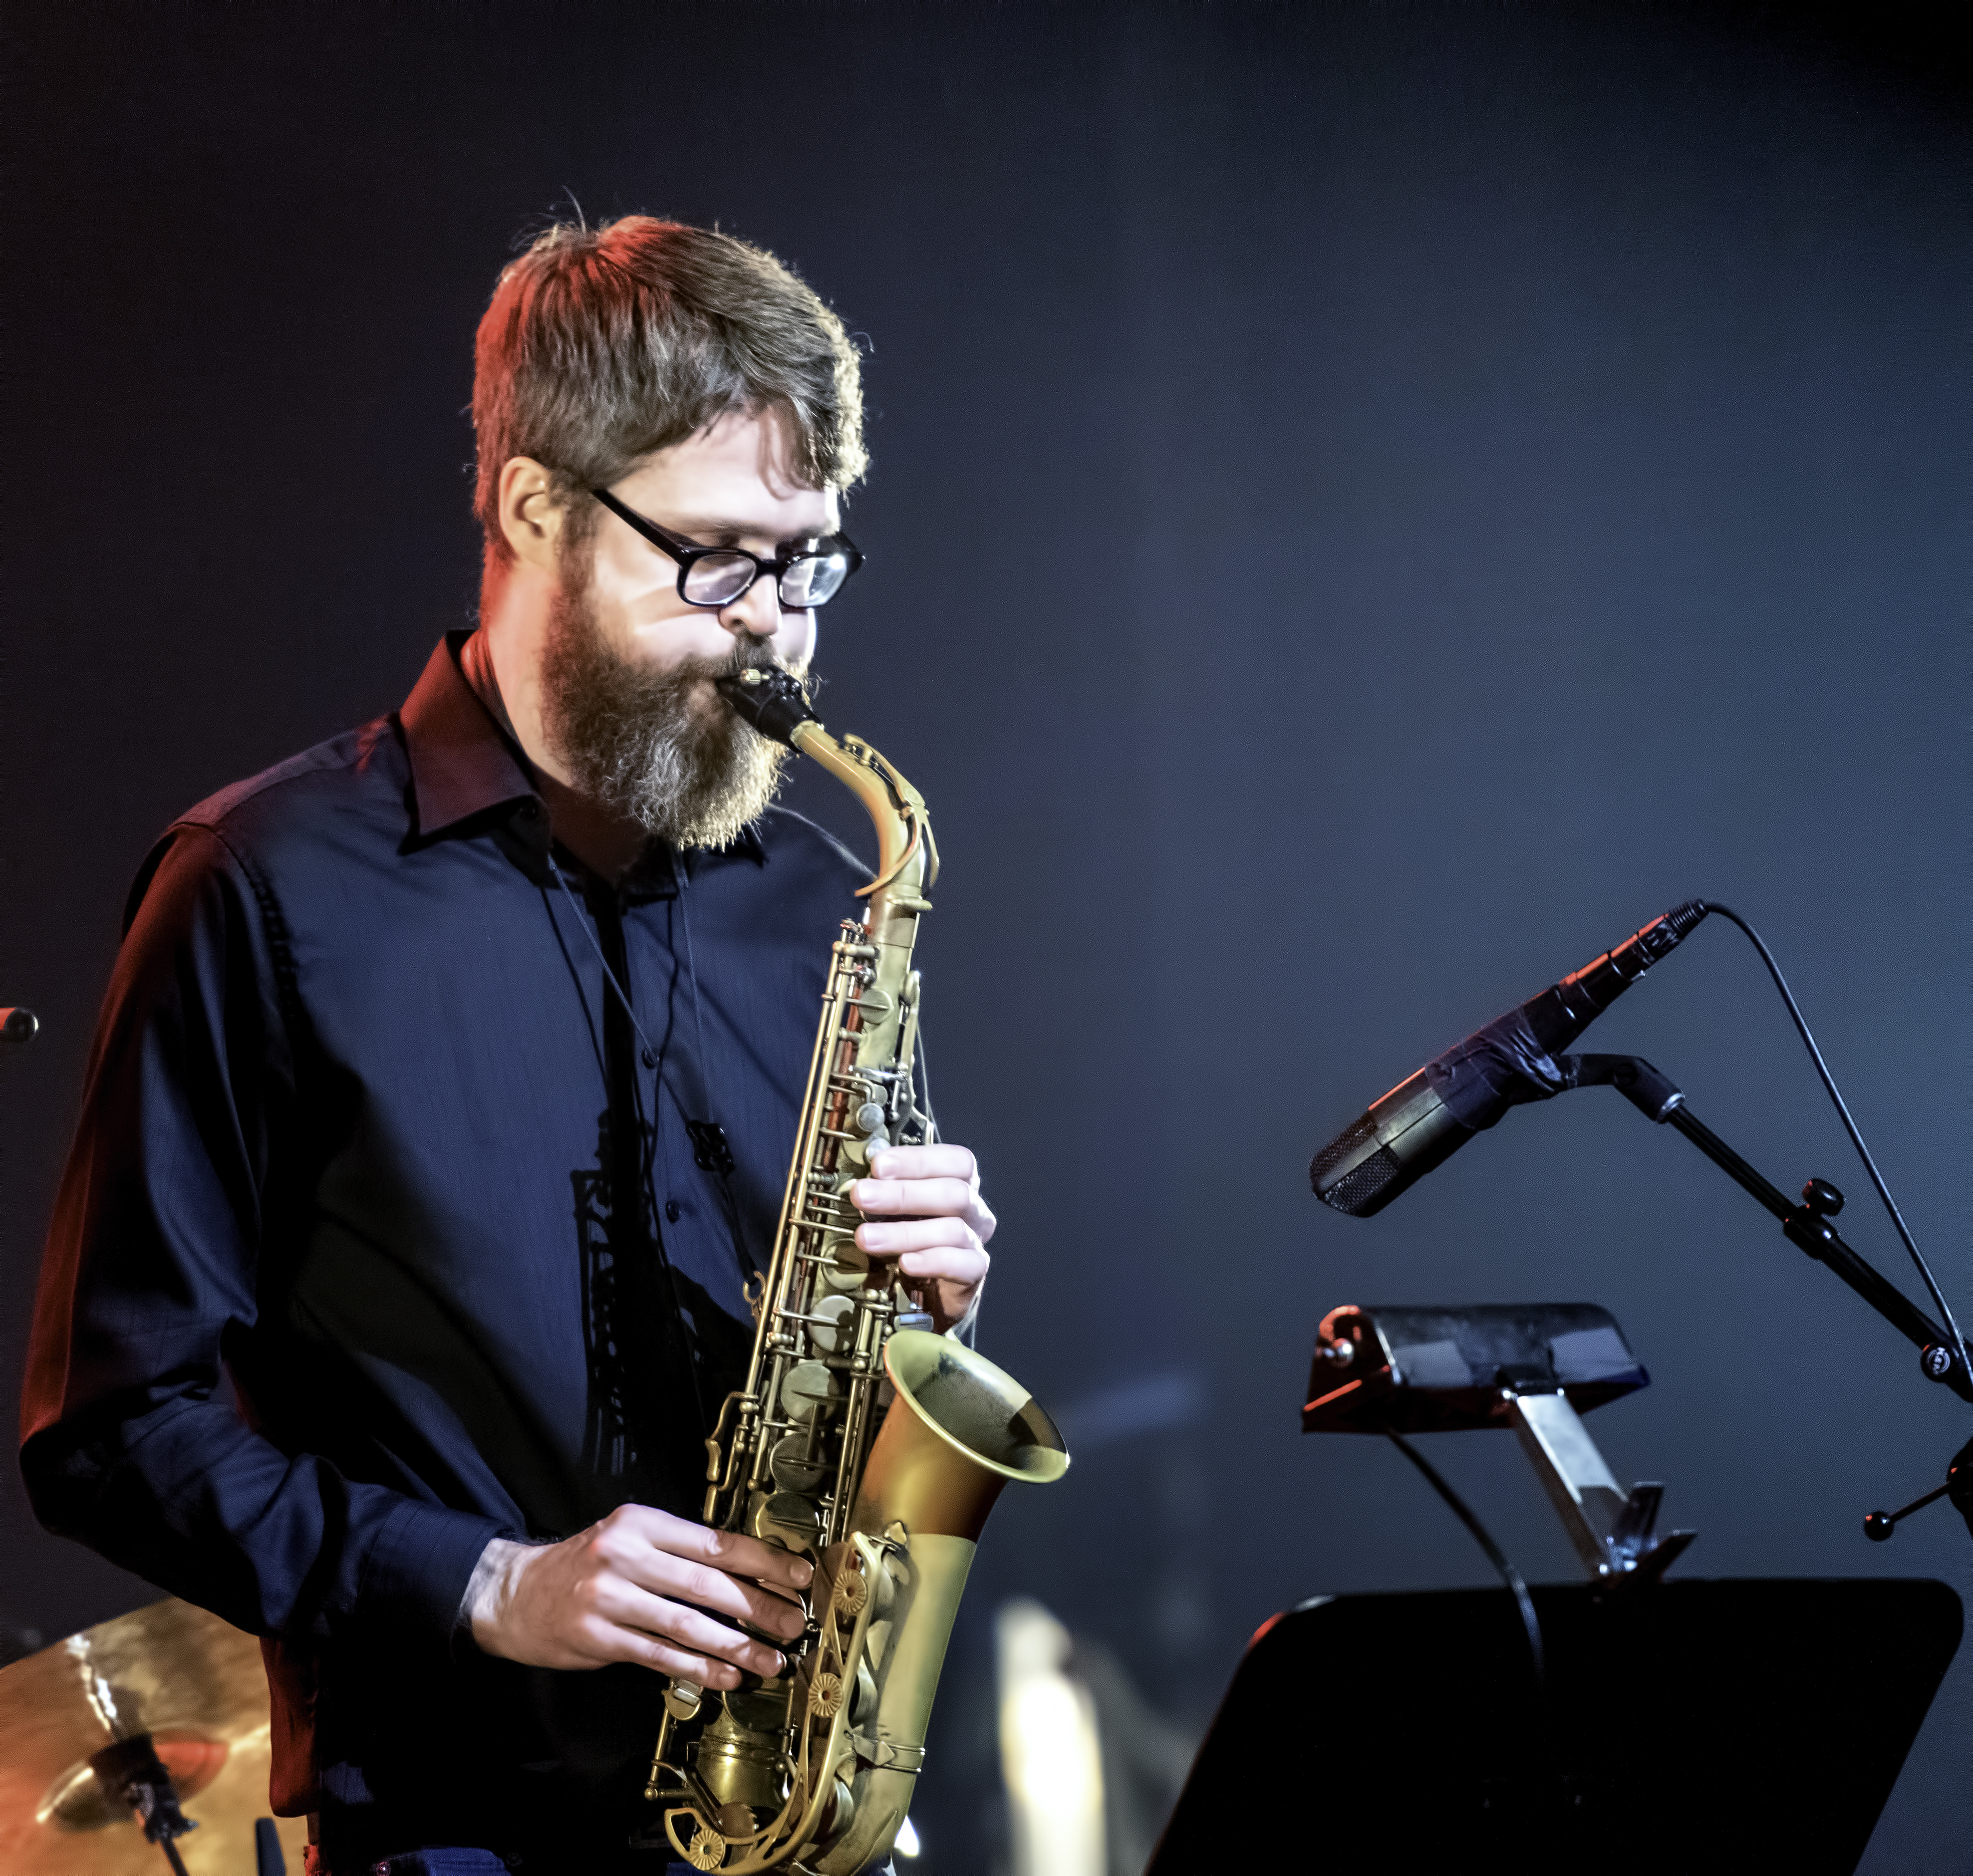 Erik Hove with the Alex Lefaivre YUL Quartet At The Montreal International Jazz Festival 2019